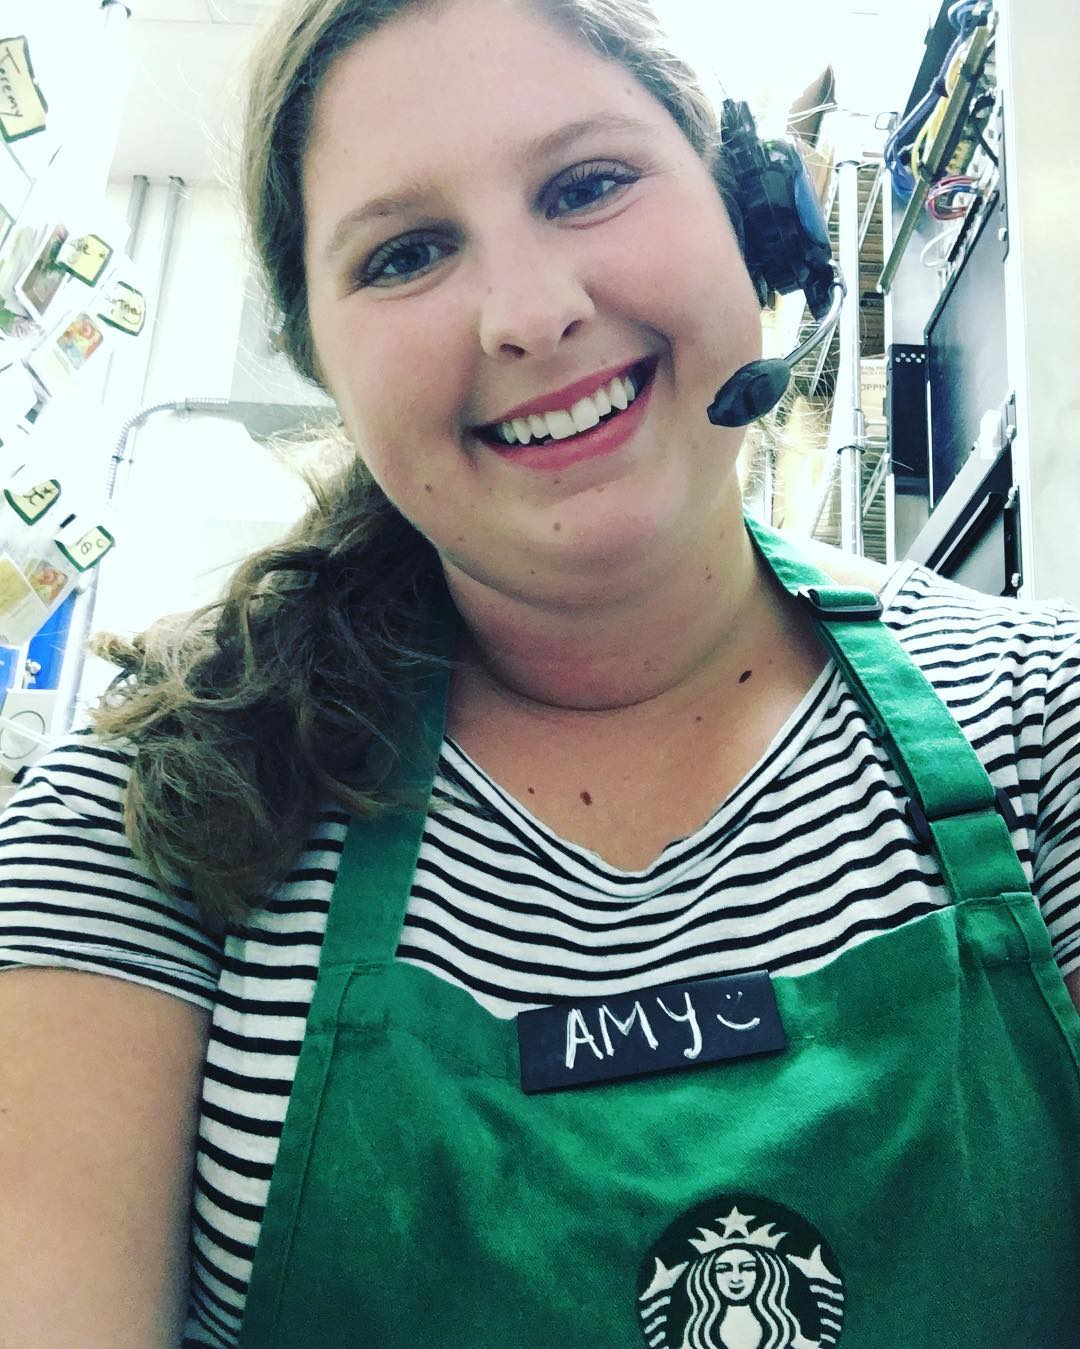 Amy Robertson Portrait Starbucks Barista